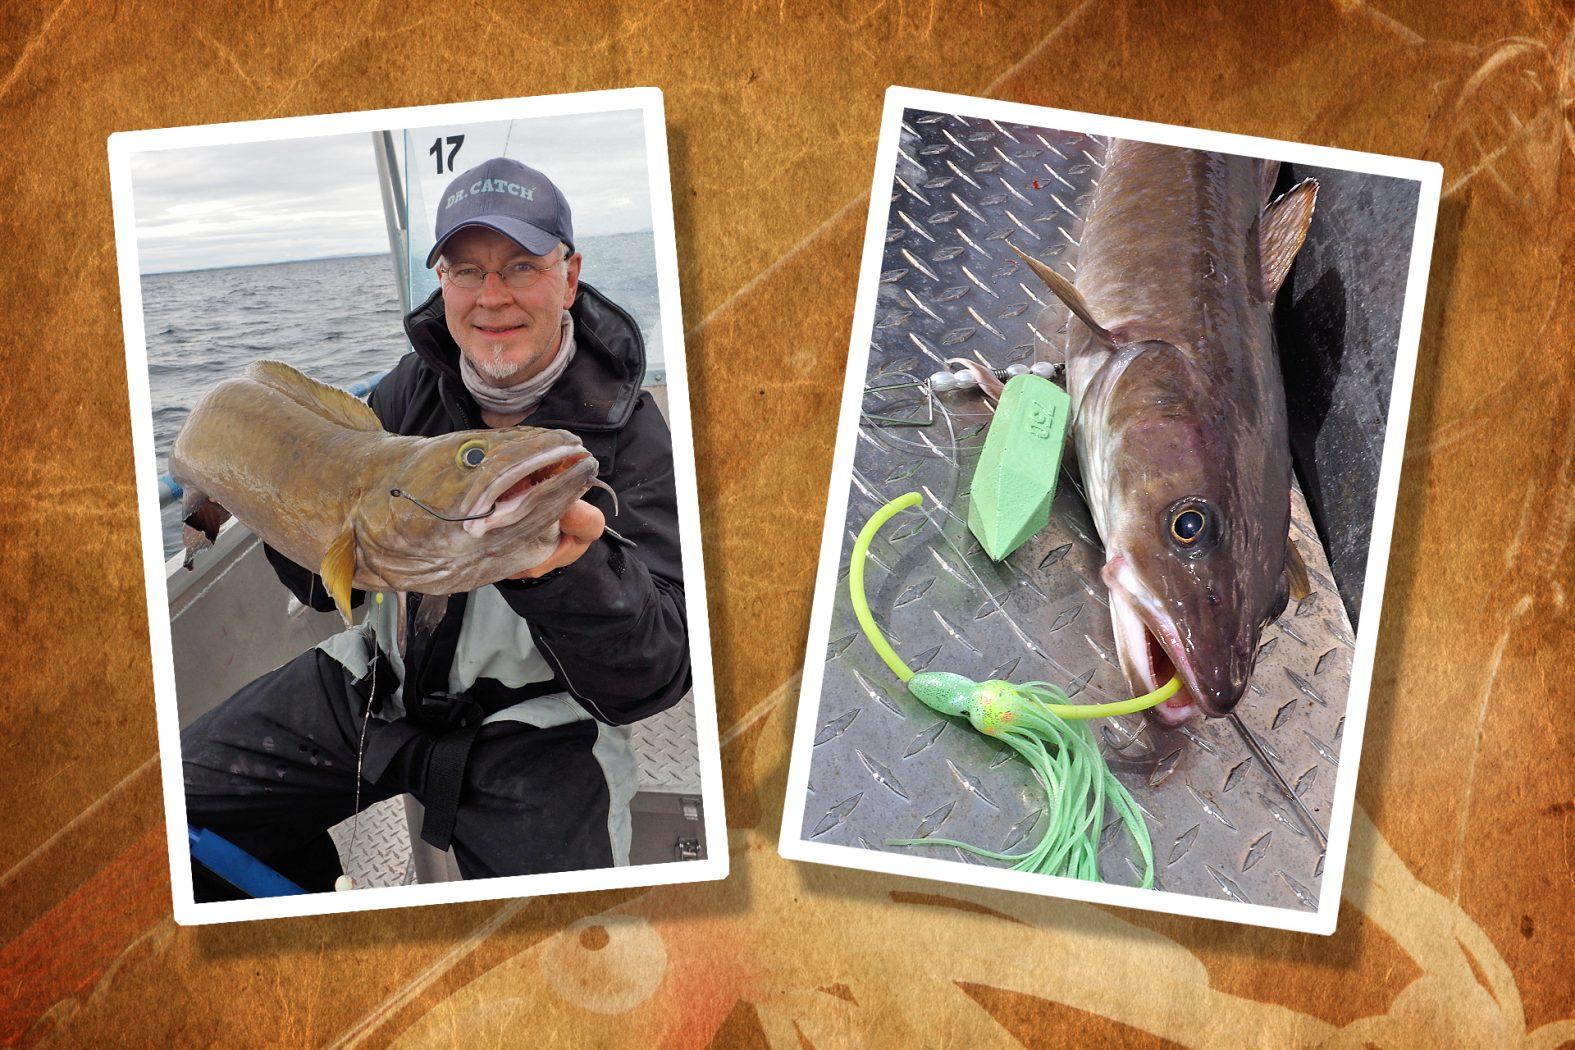 Leng und Lumb angeln in Südnorwegen